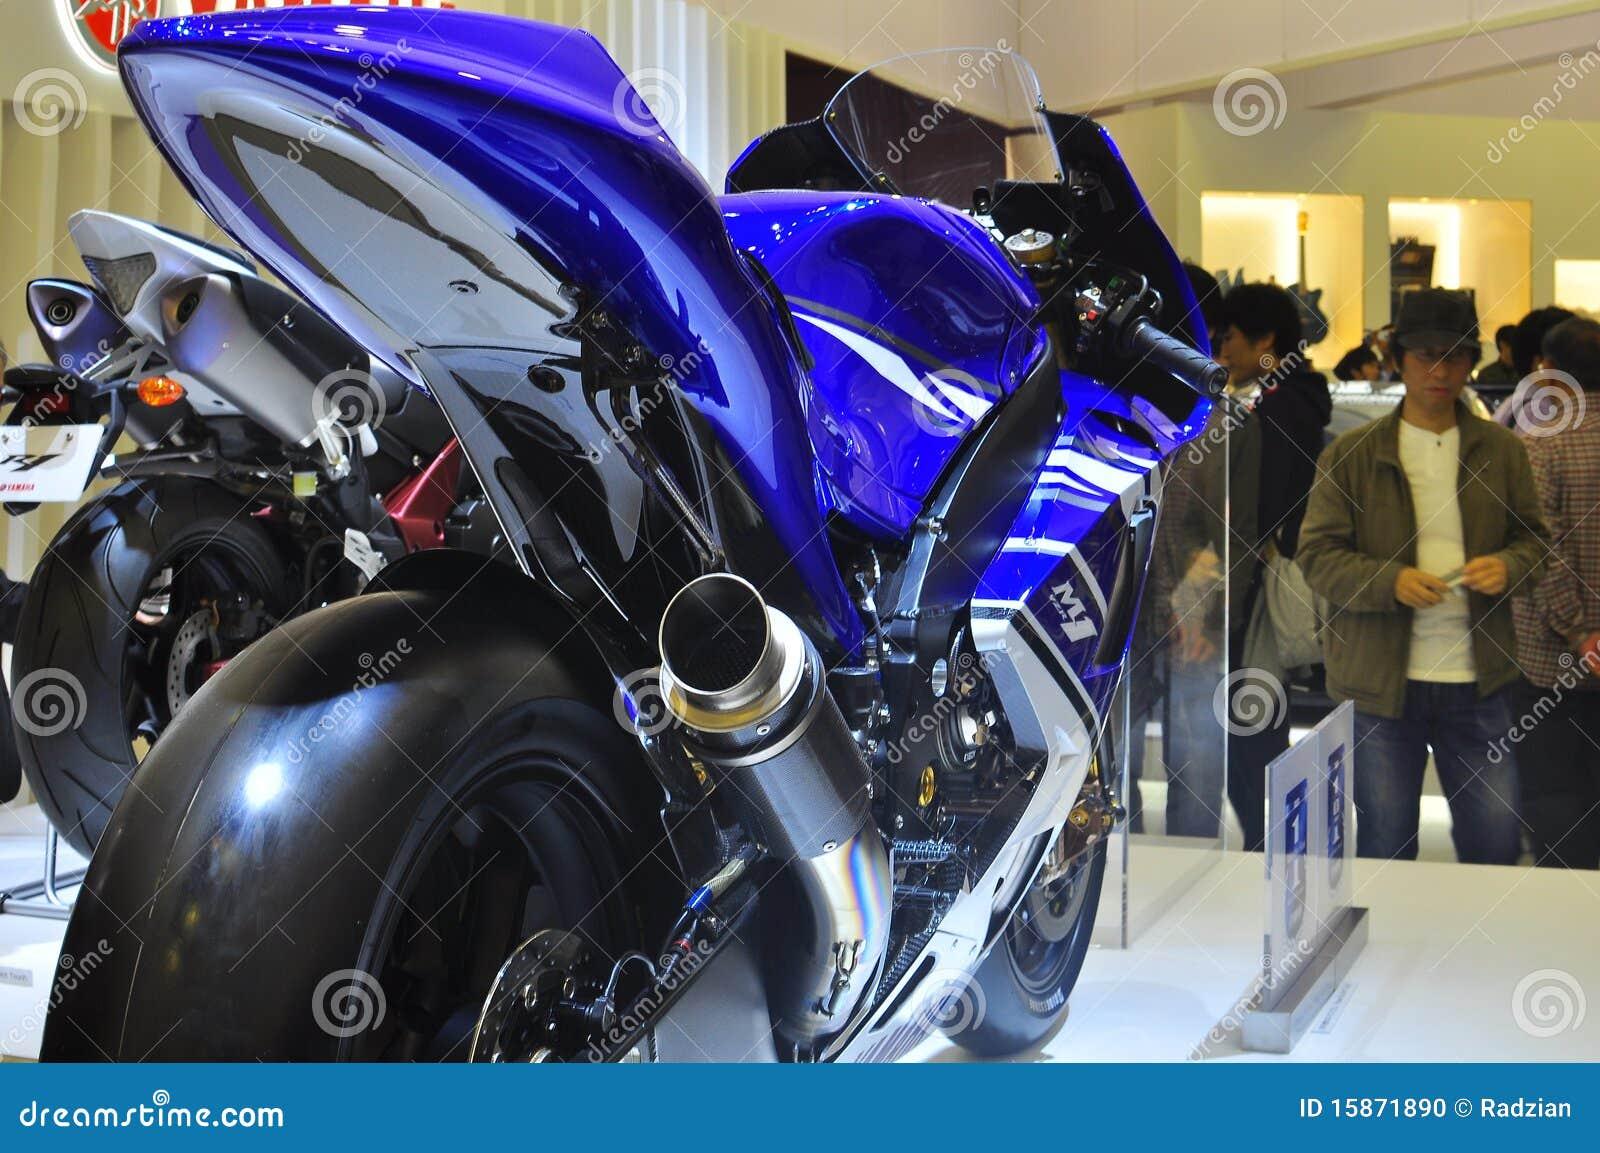 Yamaha yzr m1 tokyo motor show editorial image image of yamaha yzr m1 tokyo motor show championship grand publicscrutiny Images